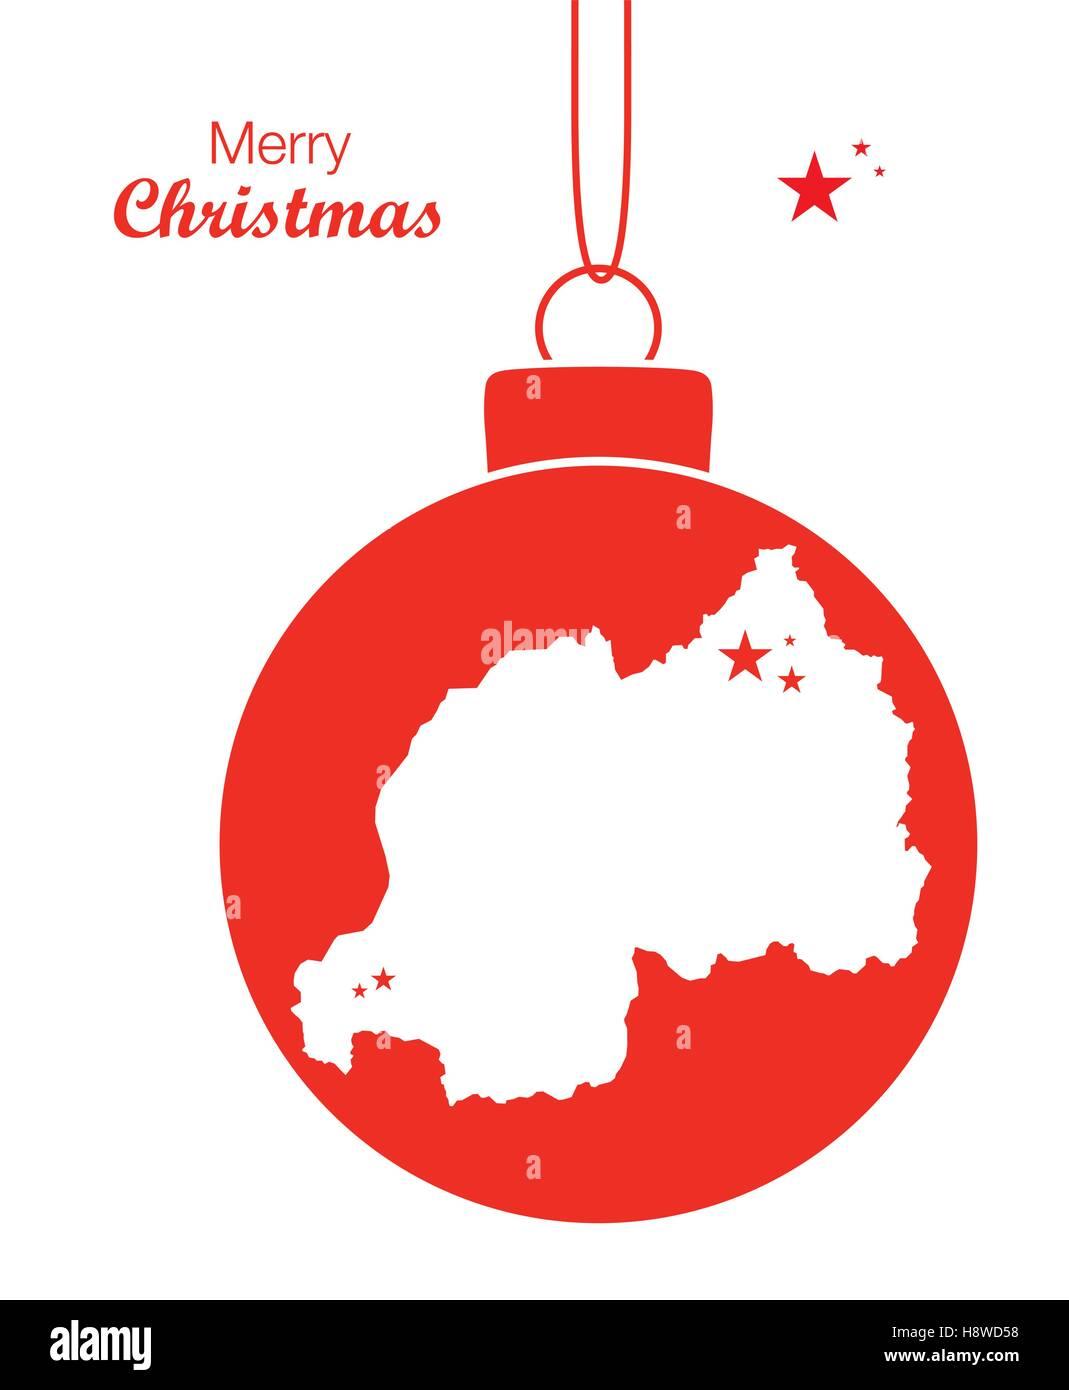 Merry Christmas illustration theme with map of Rwanda - Stock Image